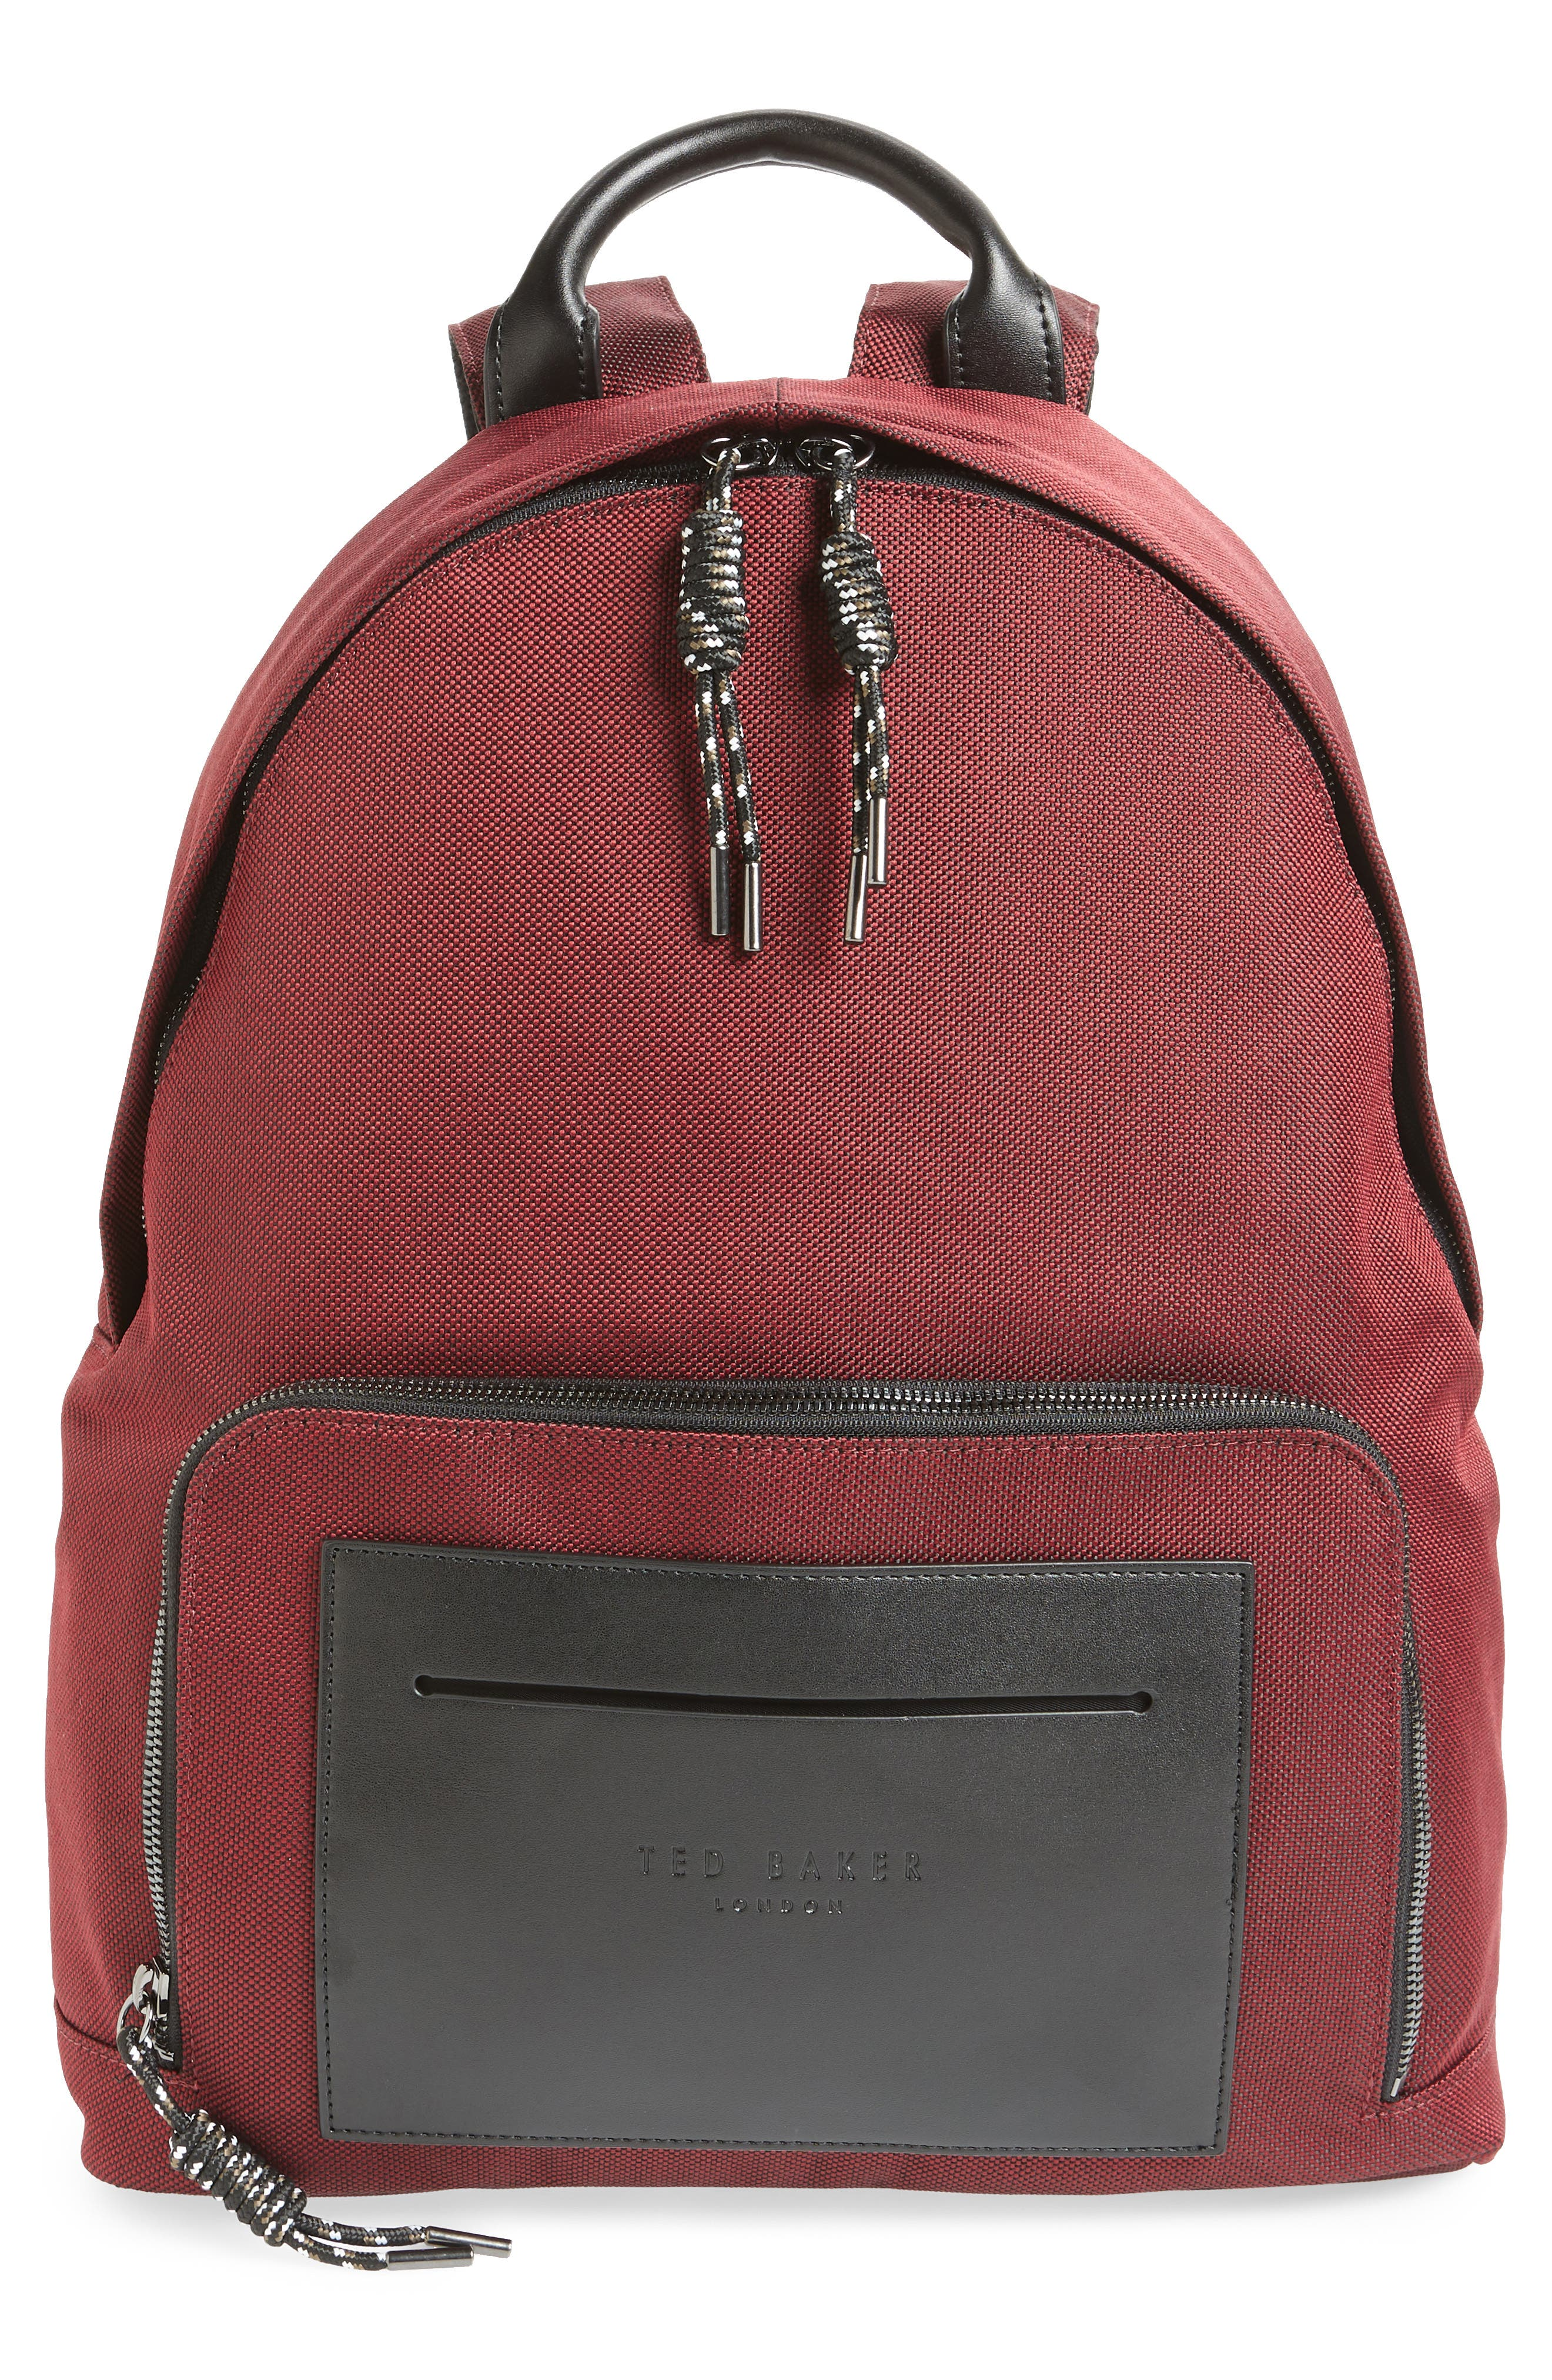 Filer Backpack,                         Main,                         color, RED